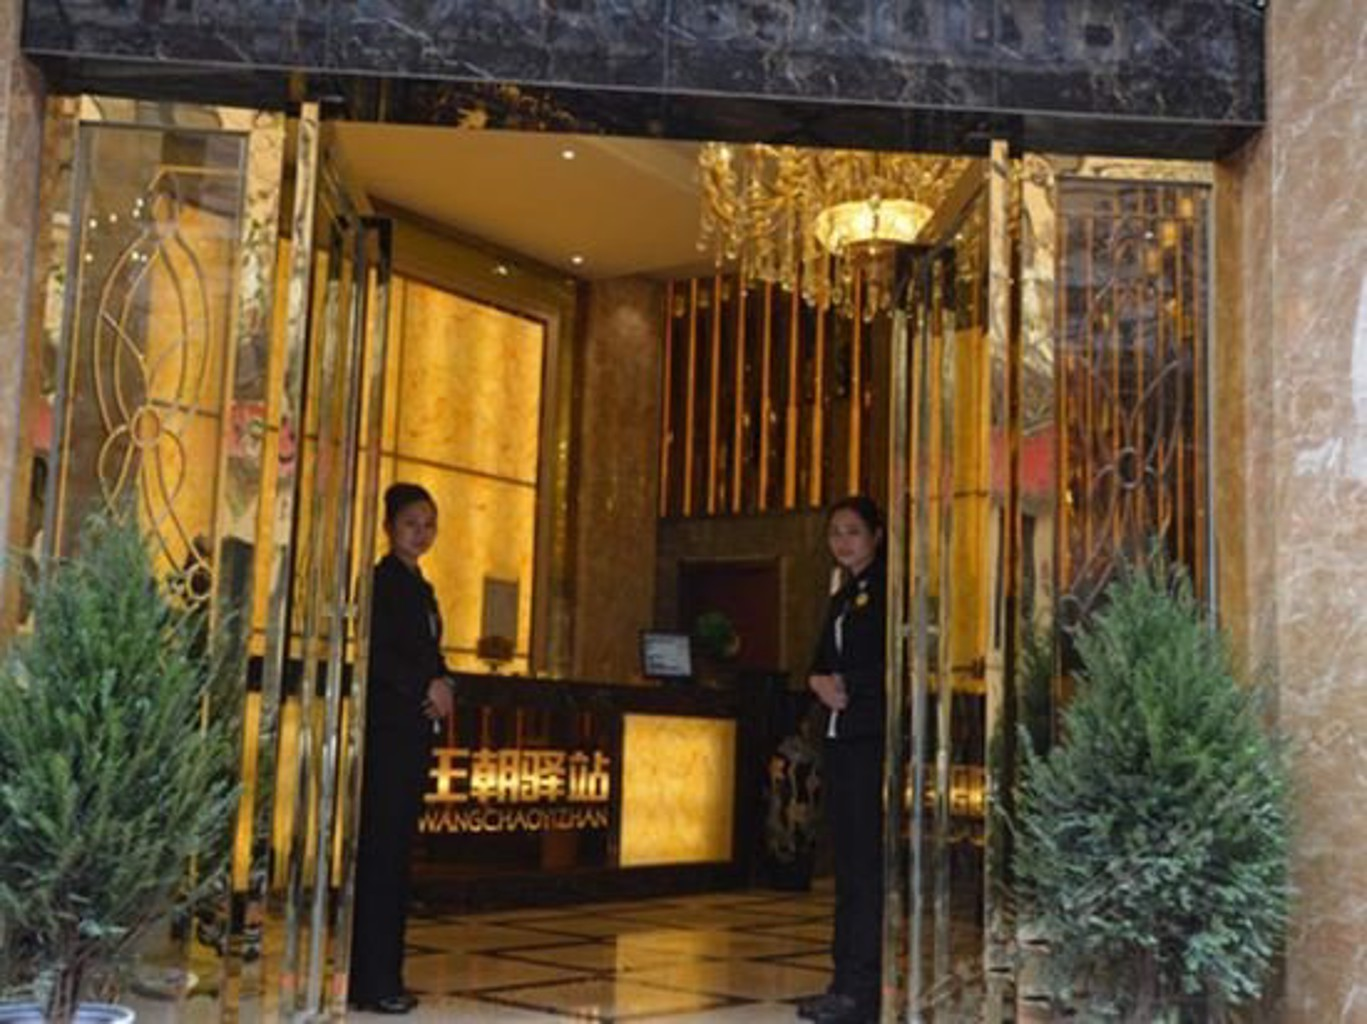 Wuhan Wangchao Business Hotel